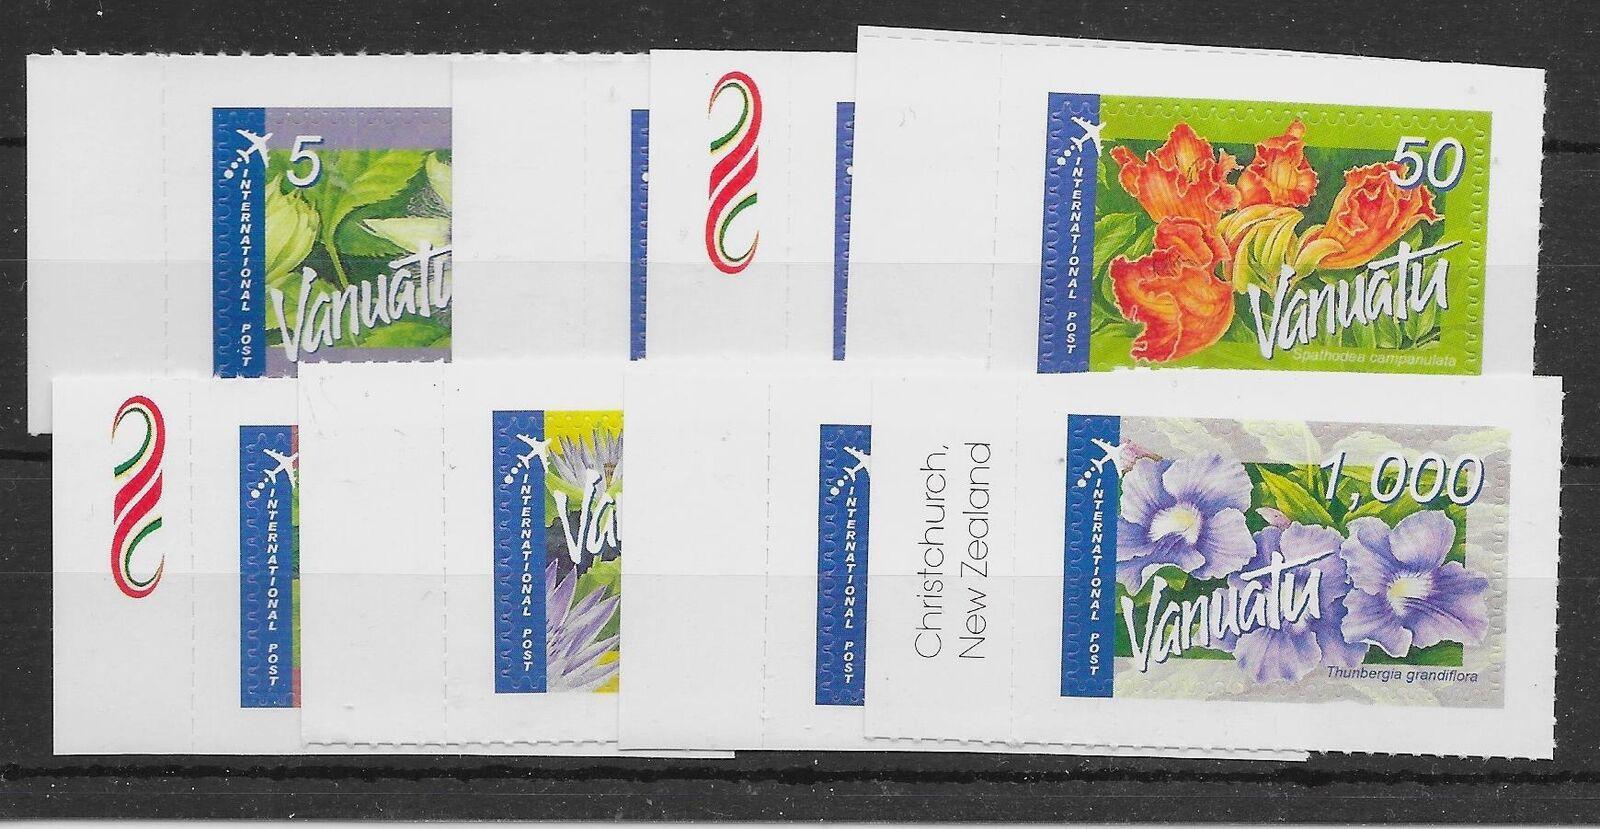 VANUATU SG982a/h 2006 FLOWERS INTERNATIONAL POST SET MNH